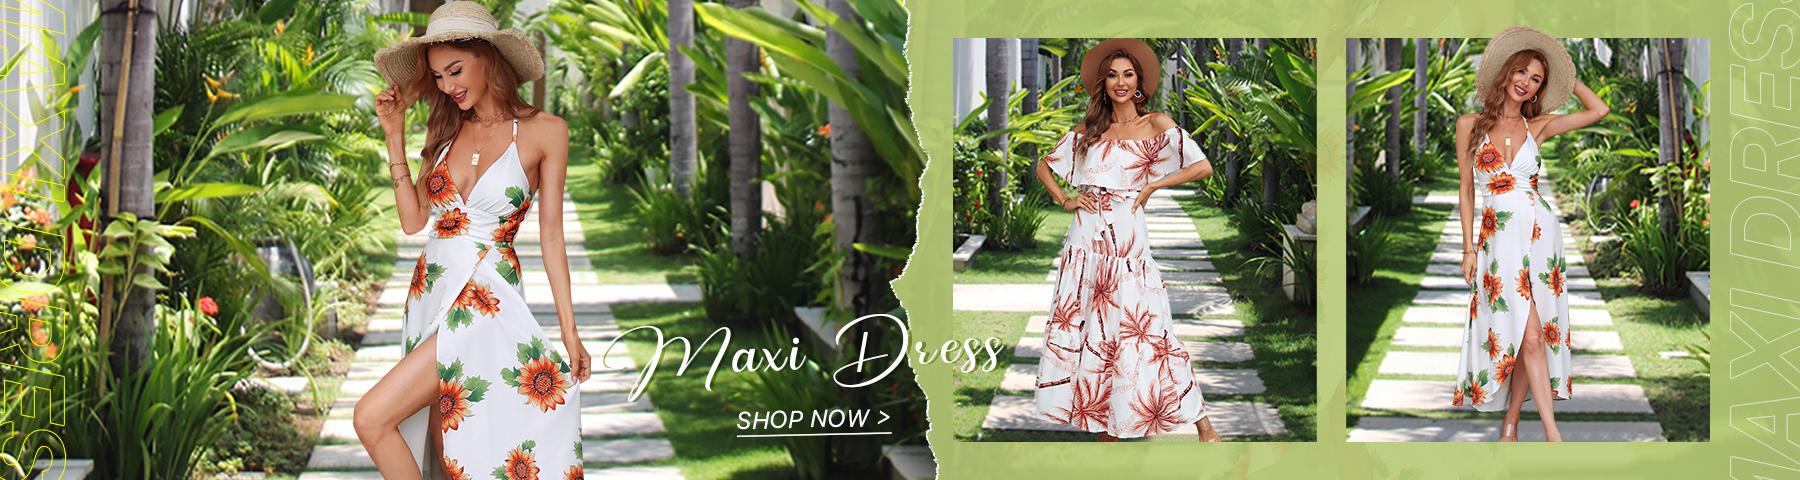 Maxi Dress In Summer